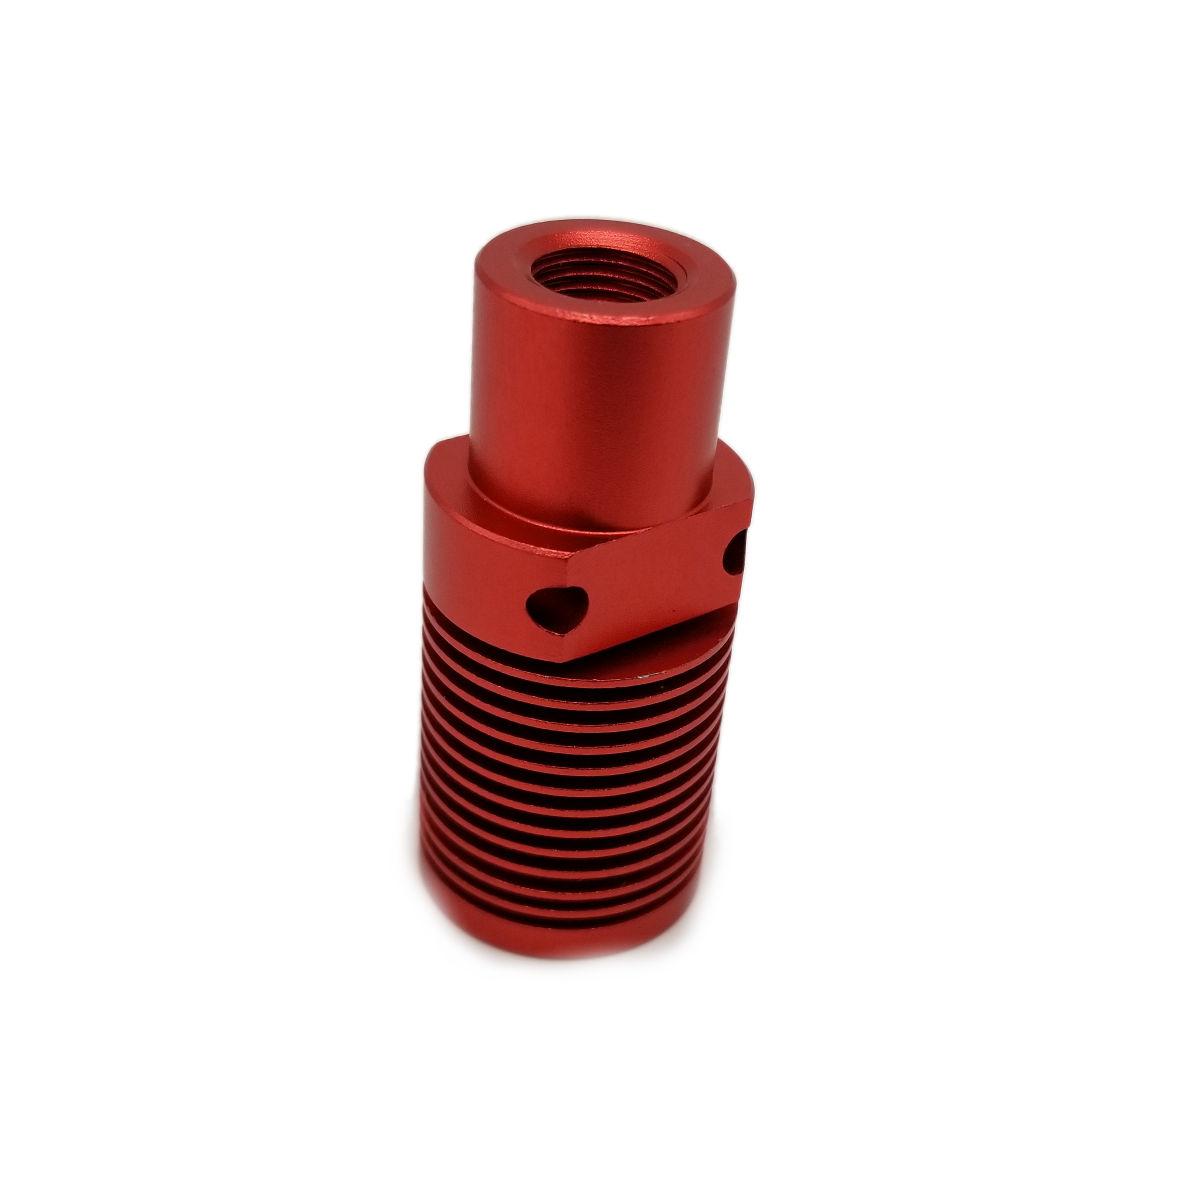 Creality CR10S Pro Heat Sink - 3D Printer Canada